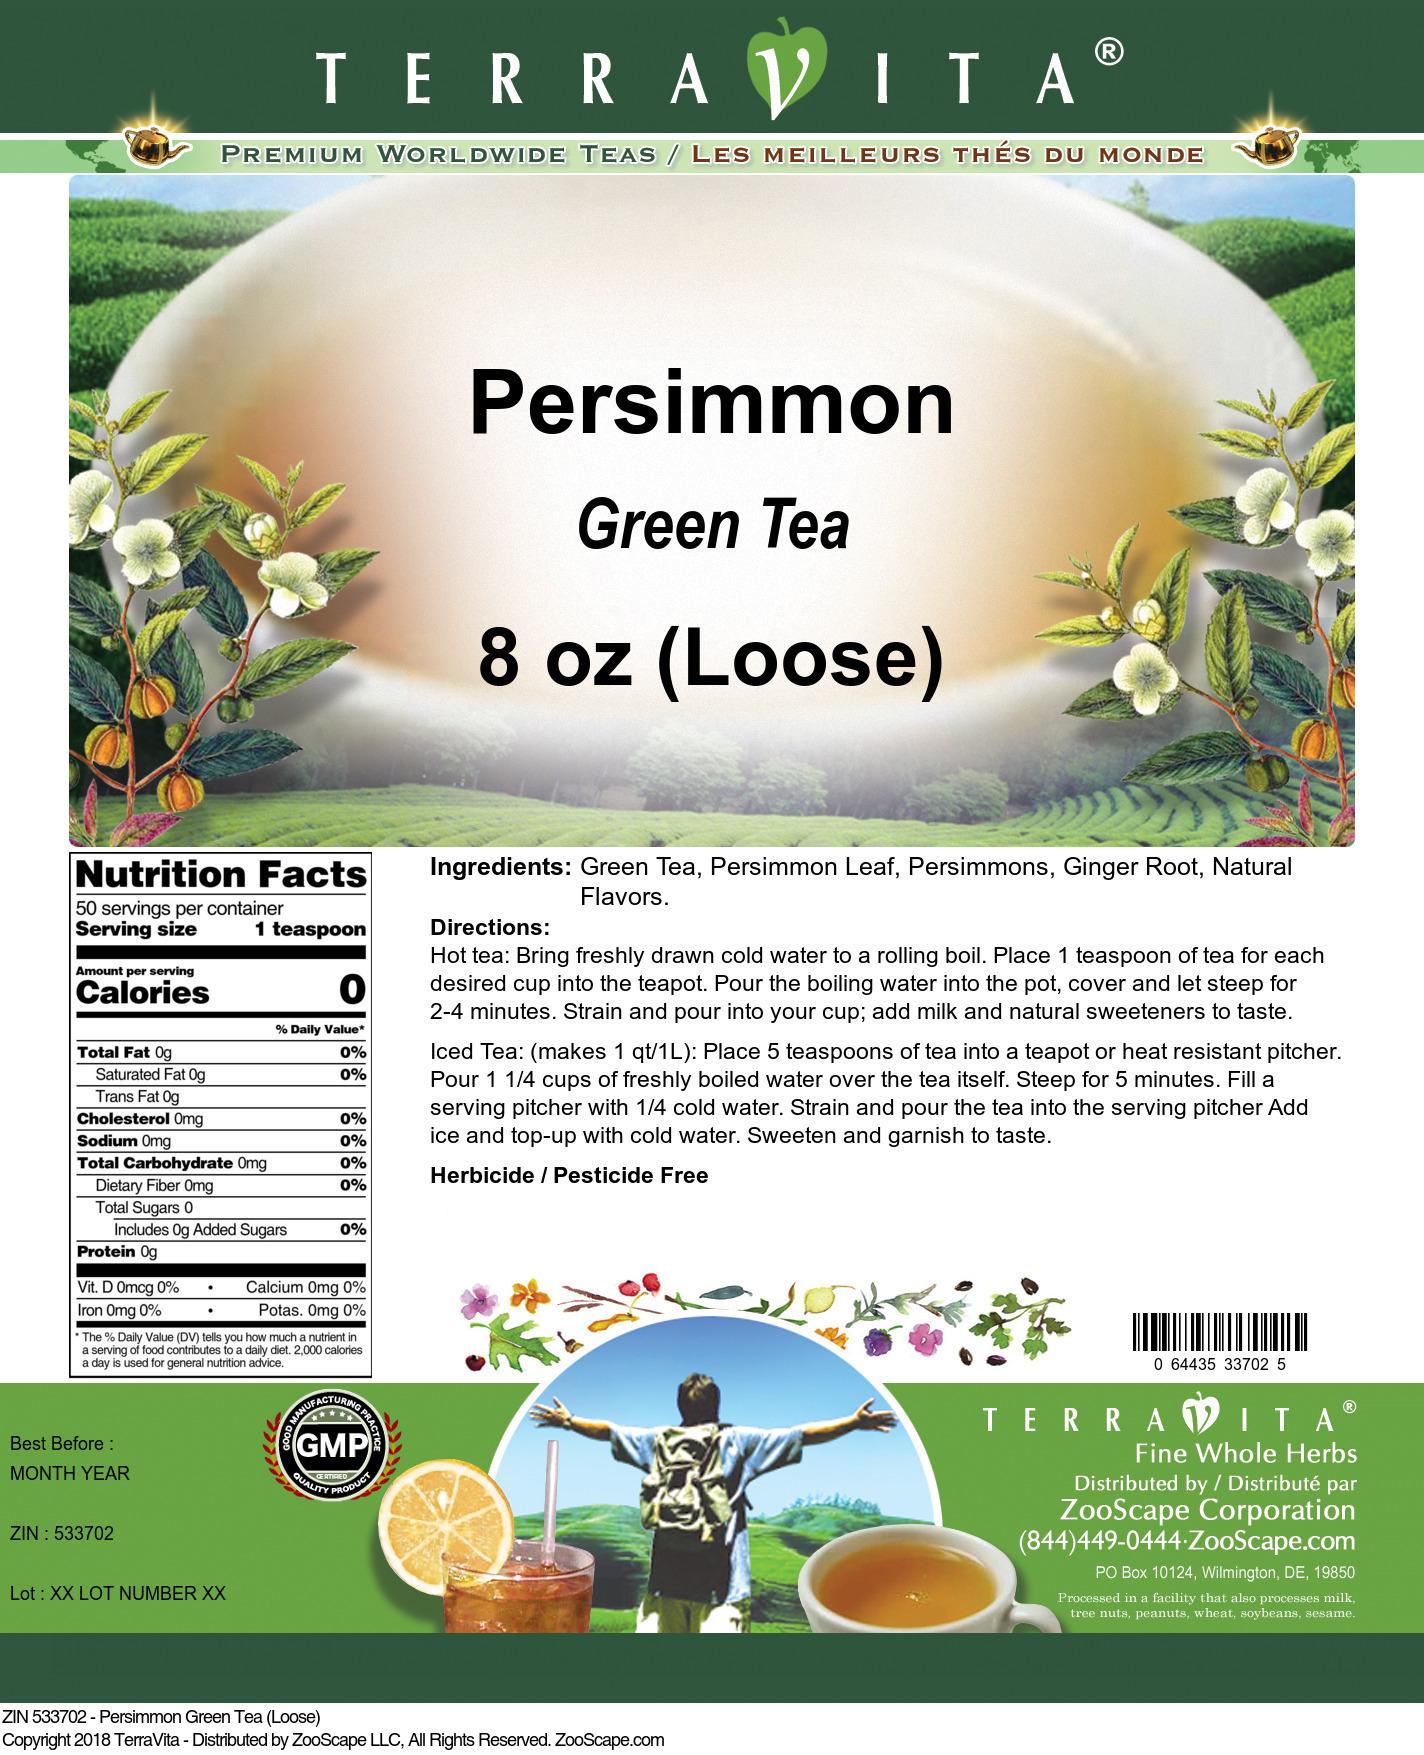 Persimmon Green Tea (Loose)